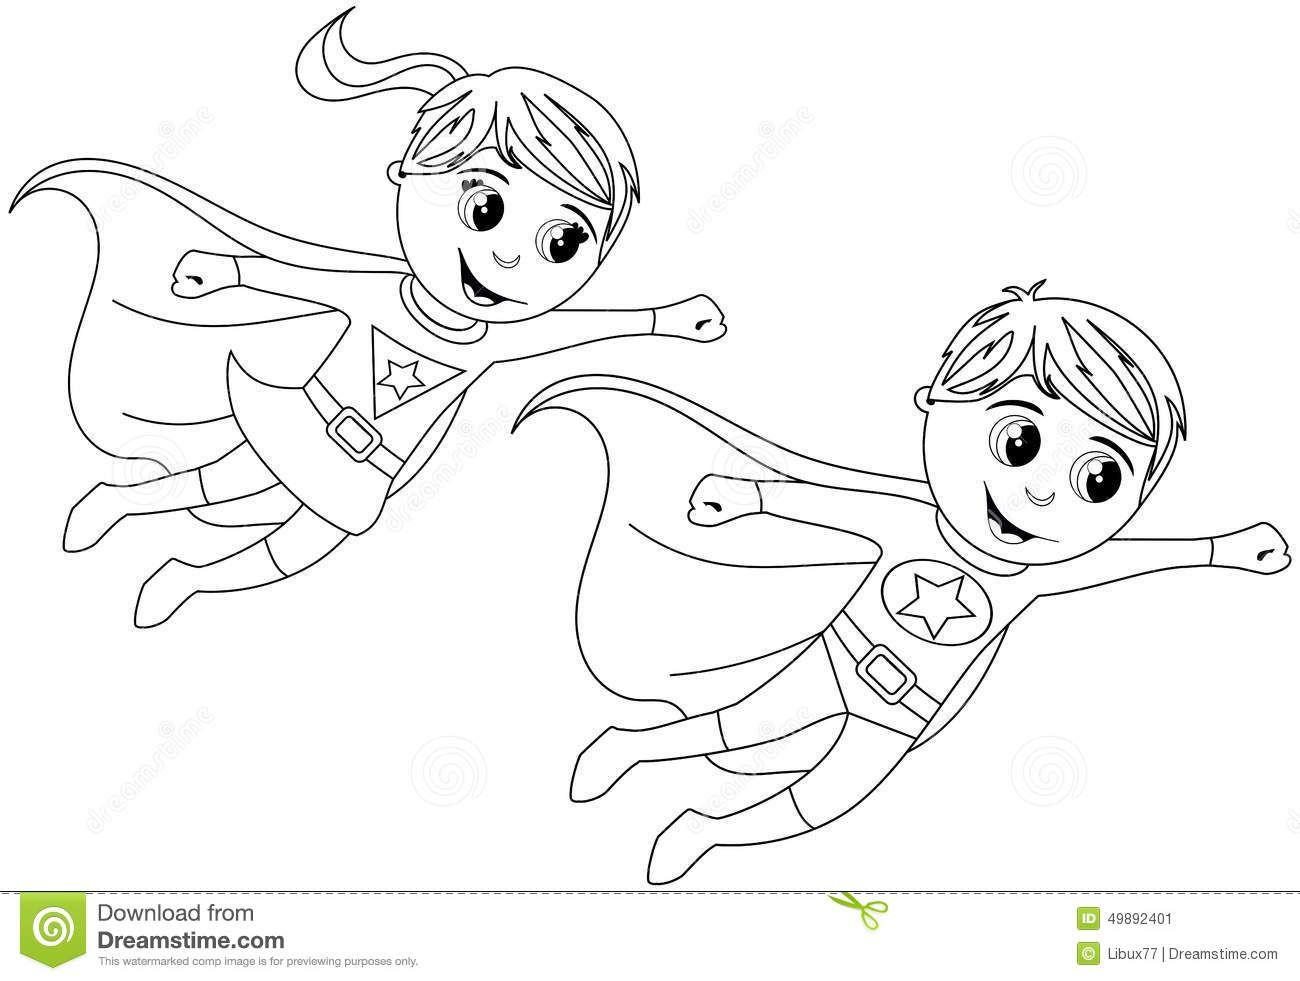 Female Superhero Drawing Template at GetDrawings.com | Free for ...